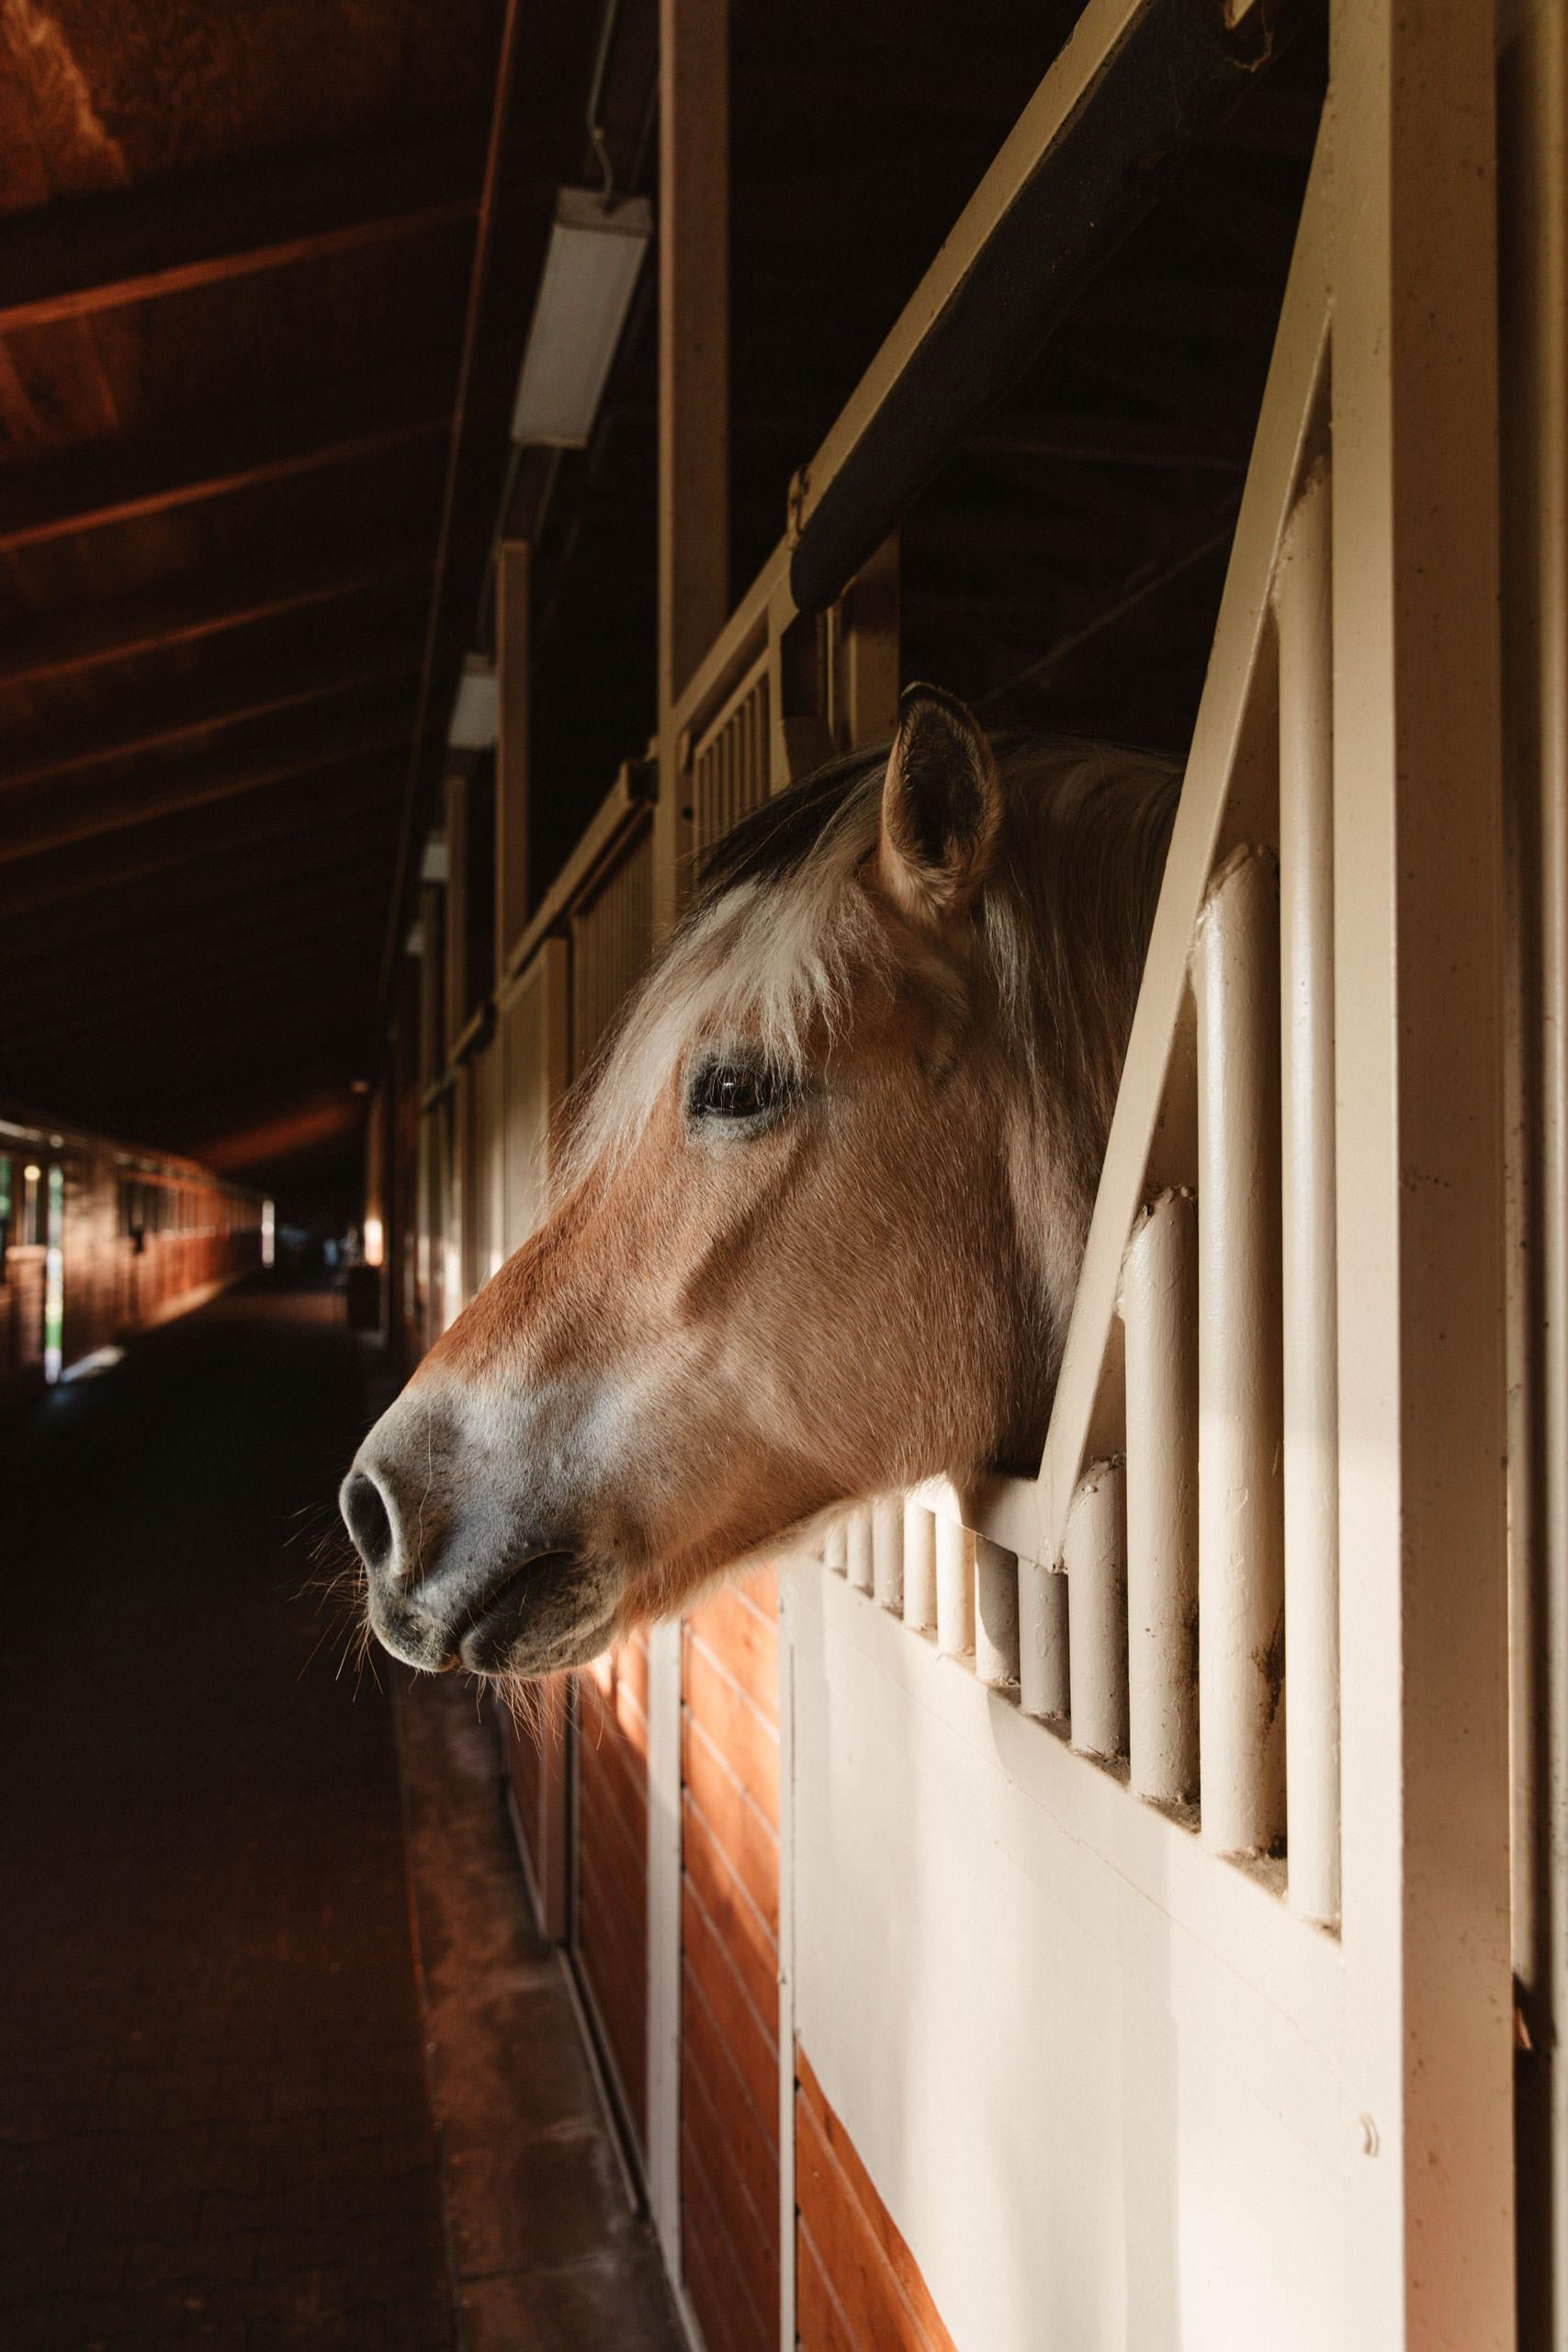 Mizel equestrian center